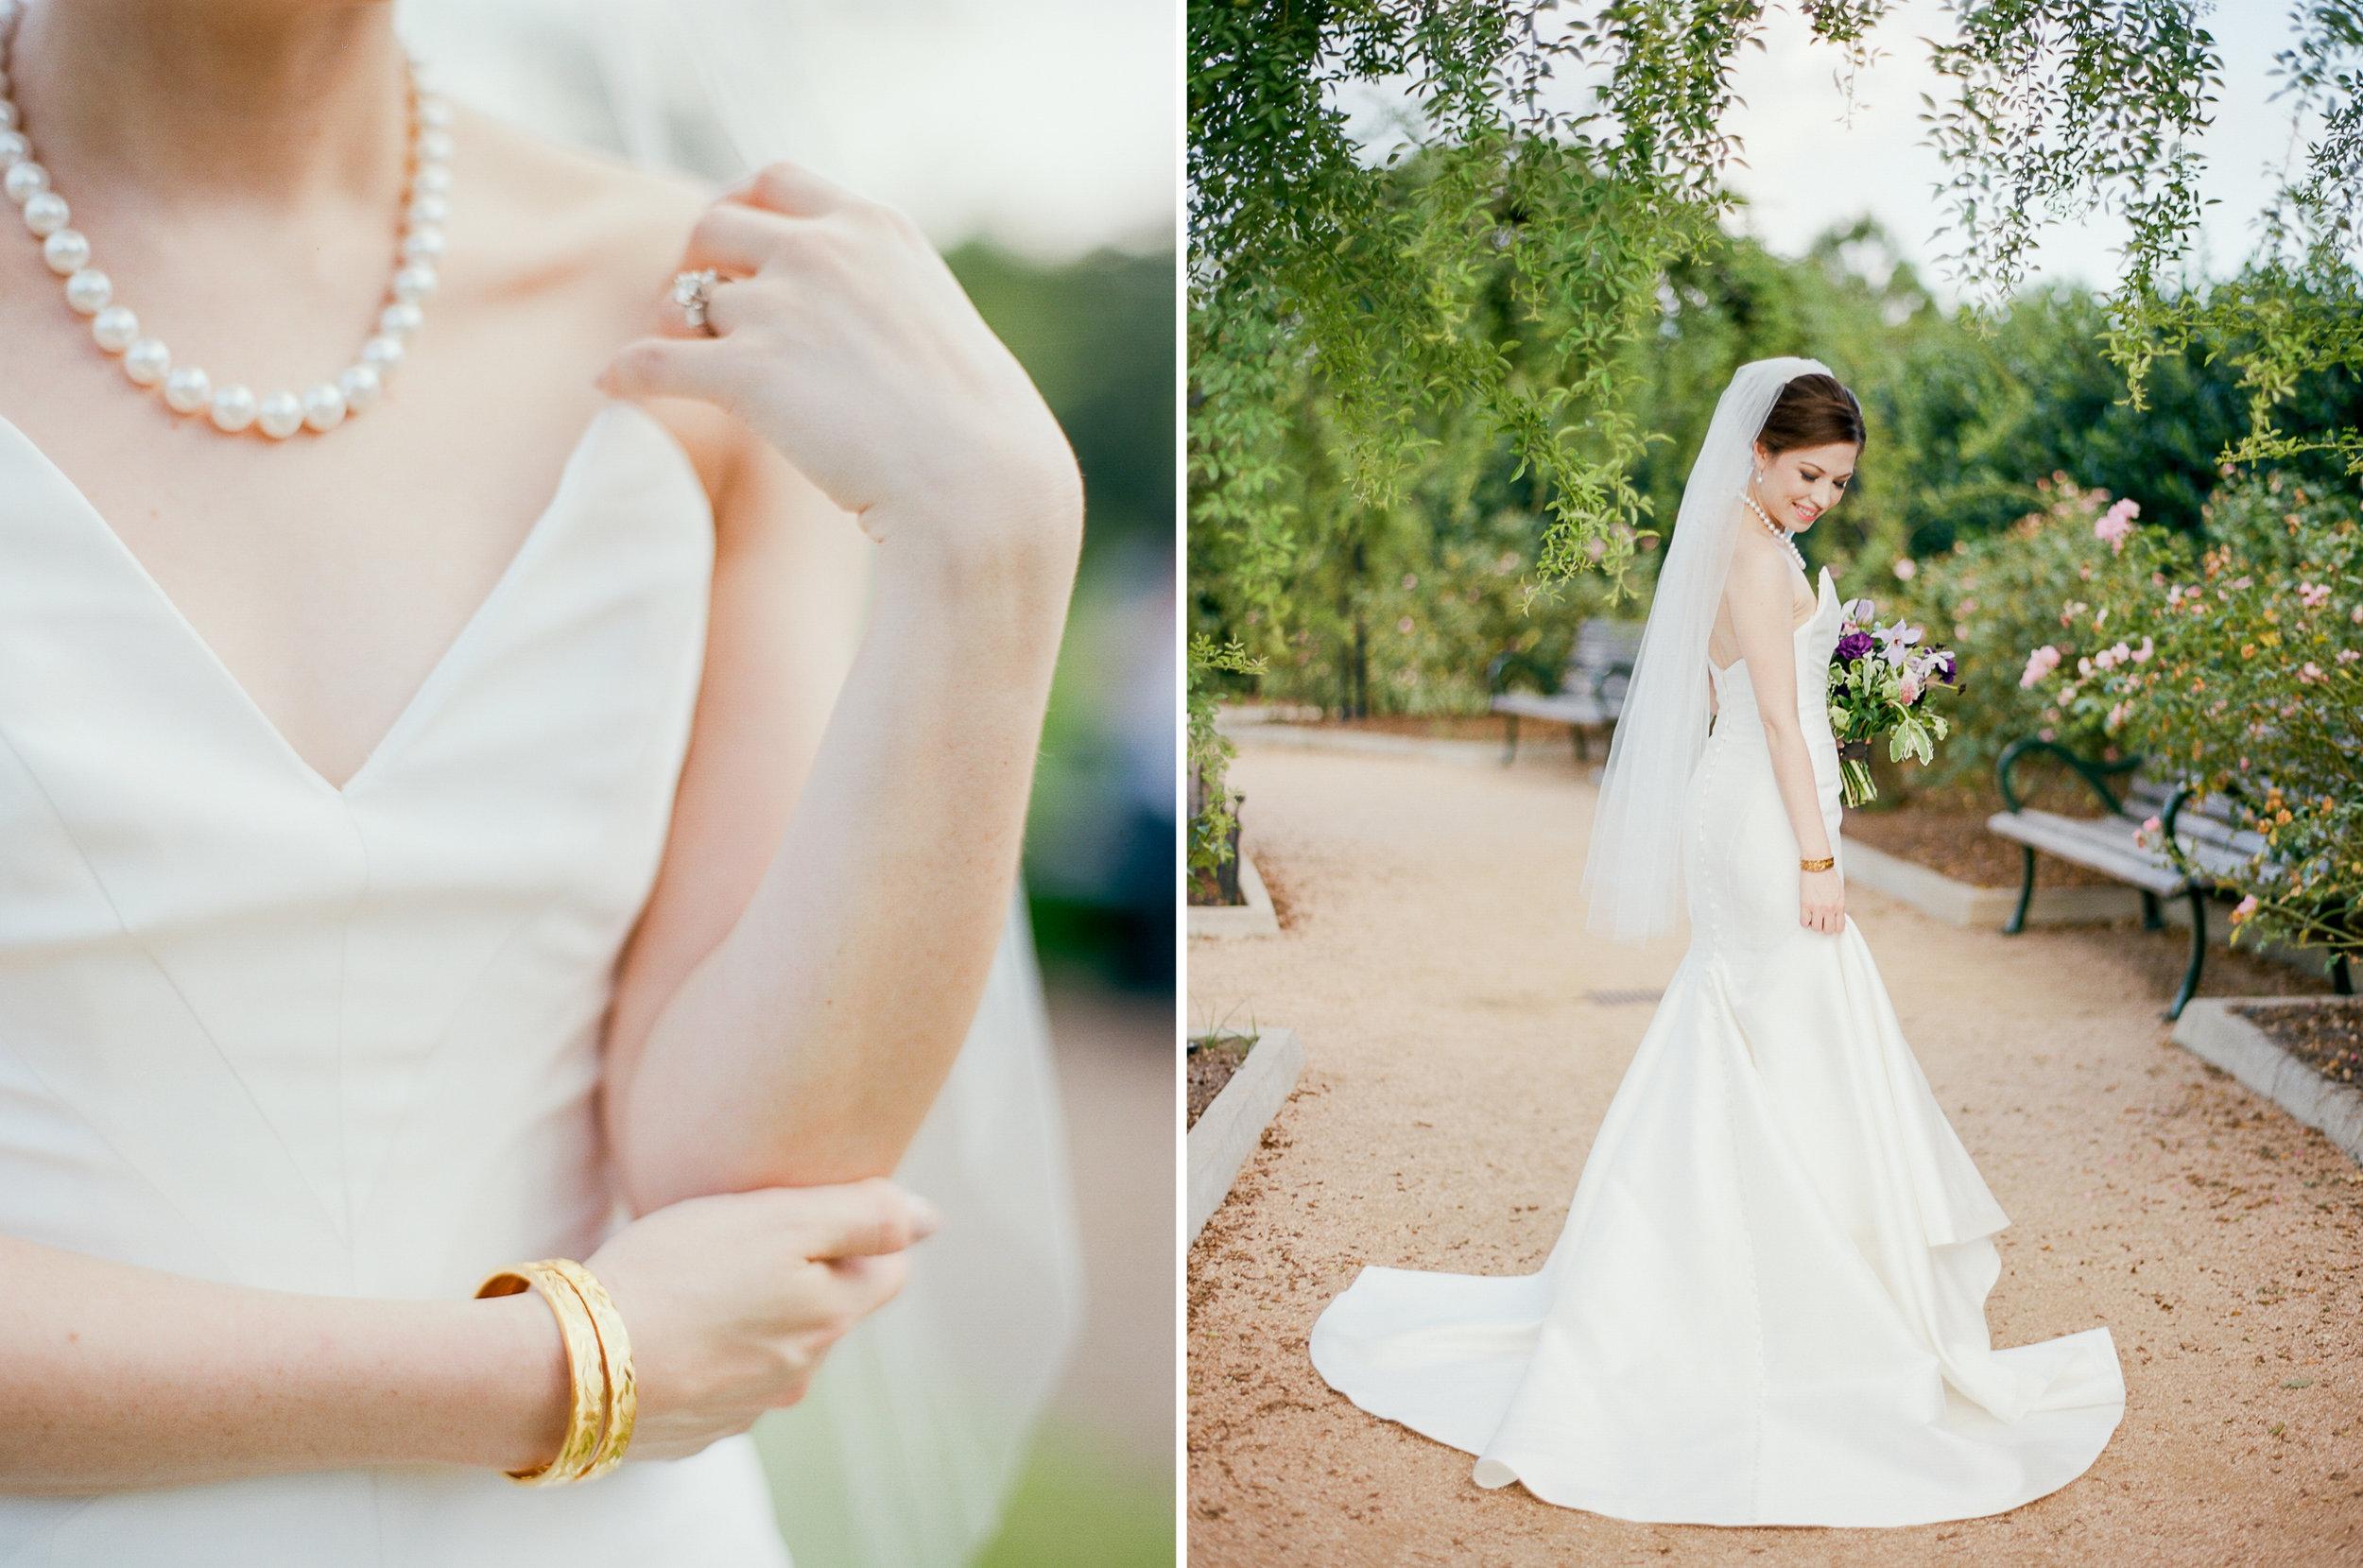 mcgovern-centennial-gardens-wedding-houston-wedding-photographer-bridals-film-austin-wedding-photographer-102.jpg